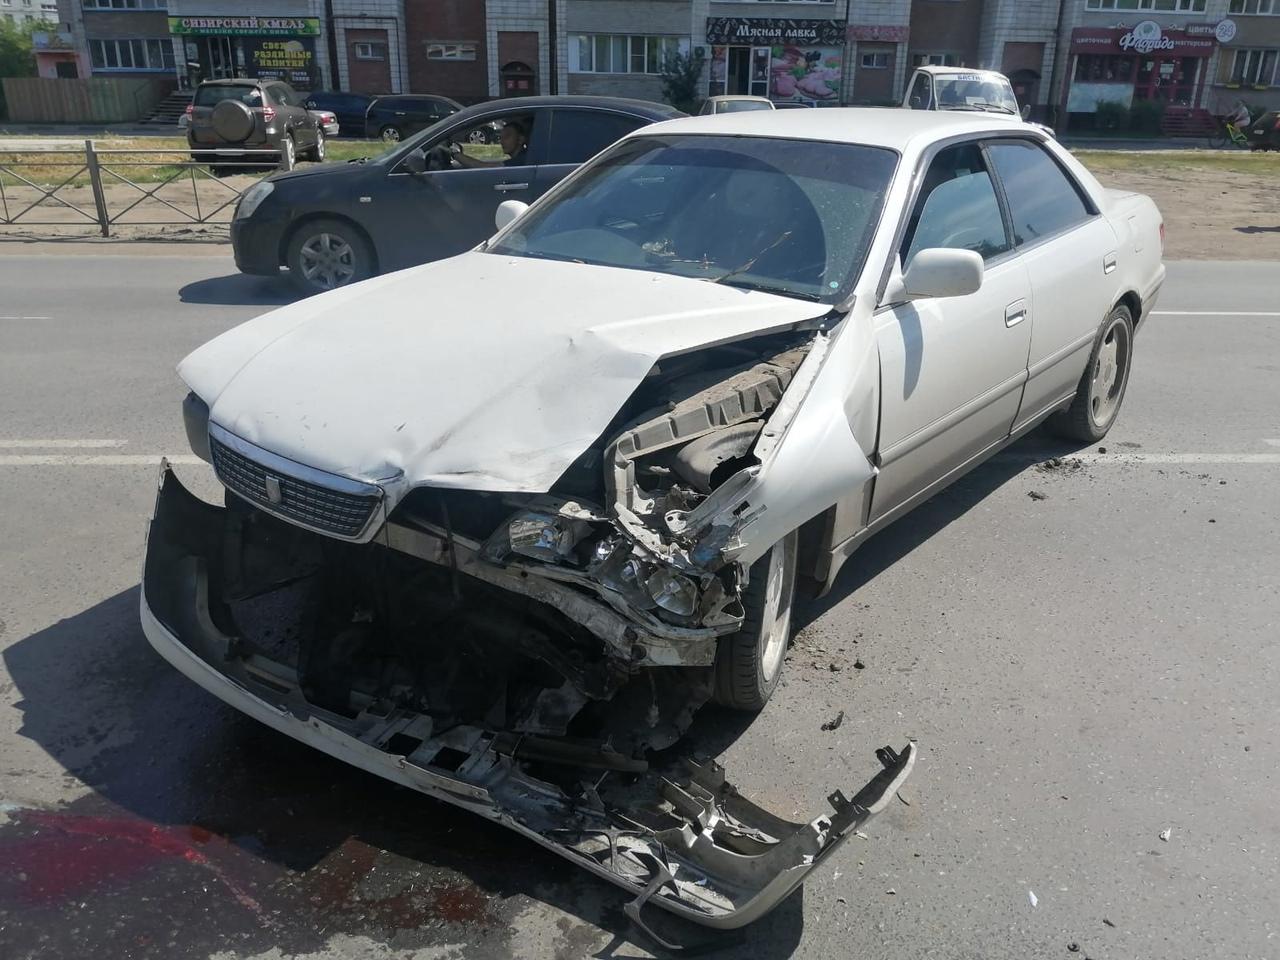 В Омске разбился мотоциклист без прав #Новости #Общество #Омск